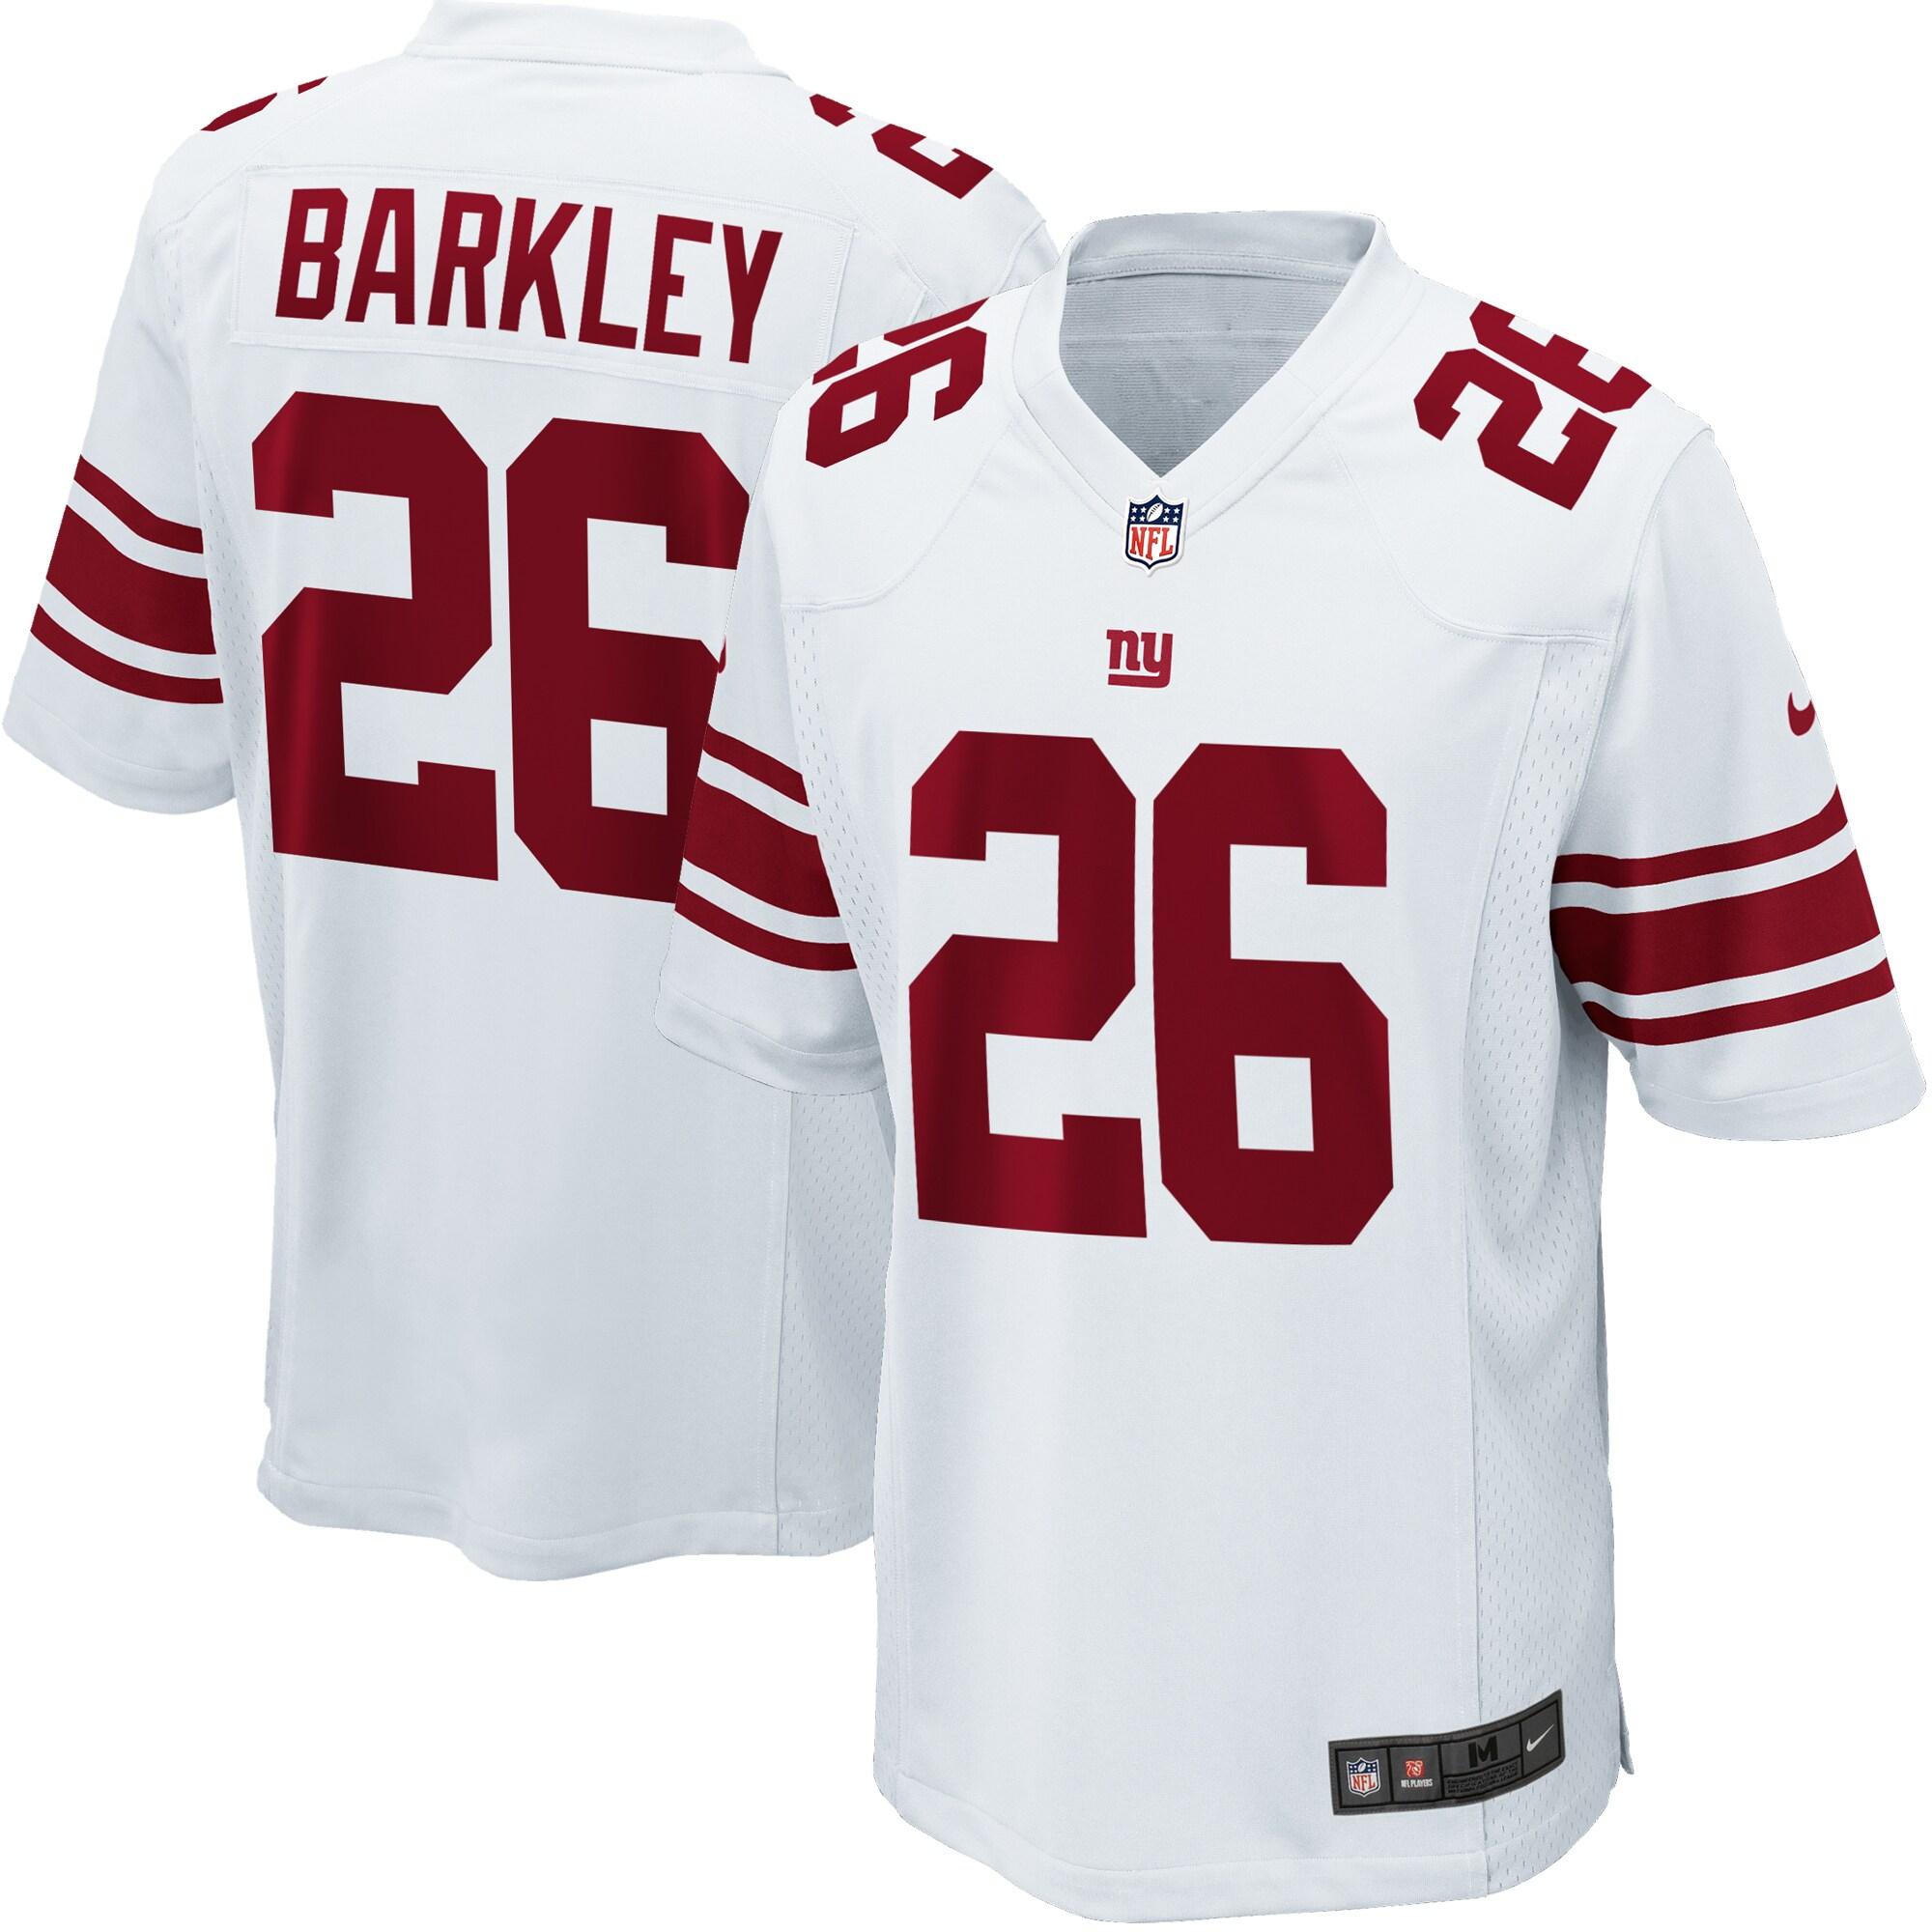 Saquon Barkley New York Giants Nike Youth Game Jersey - White